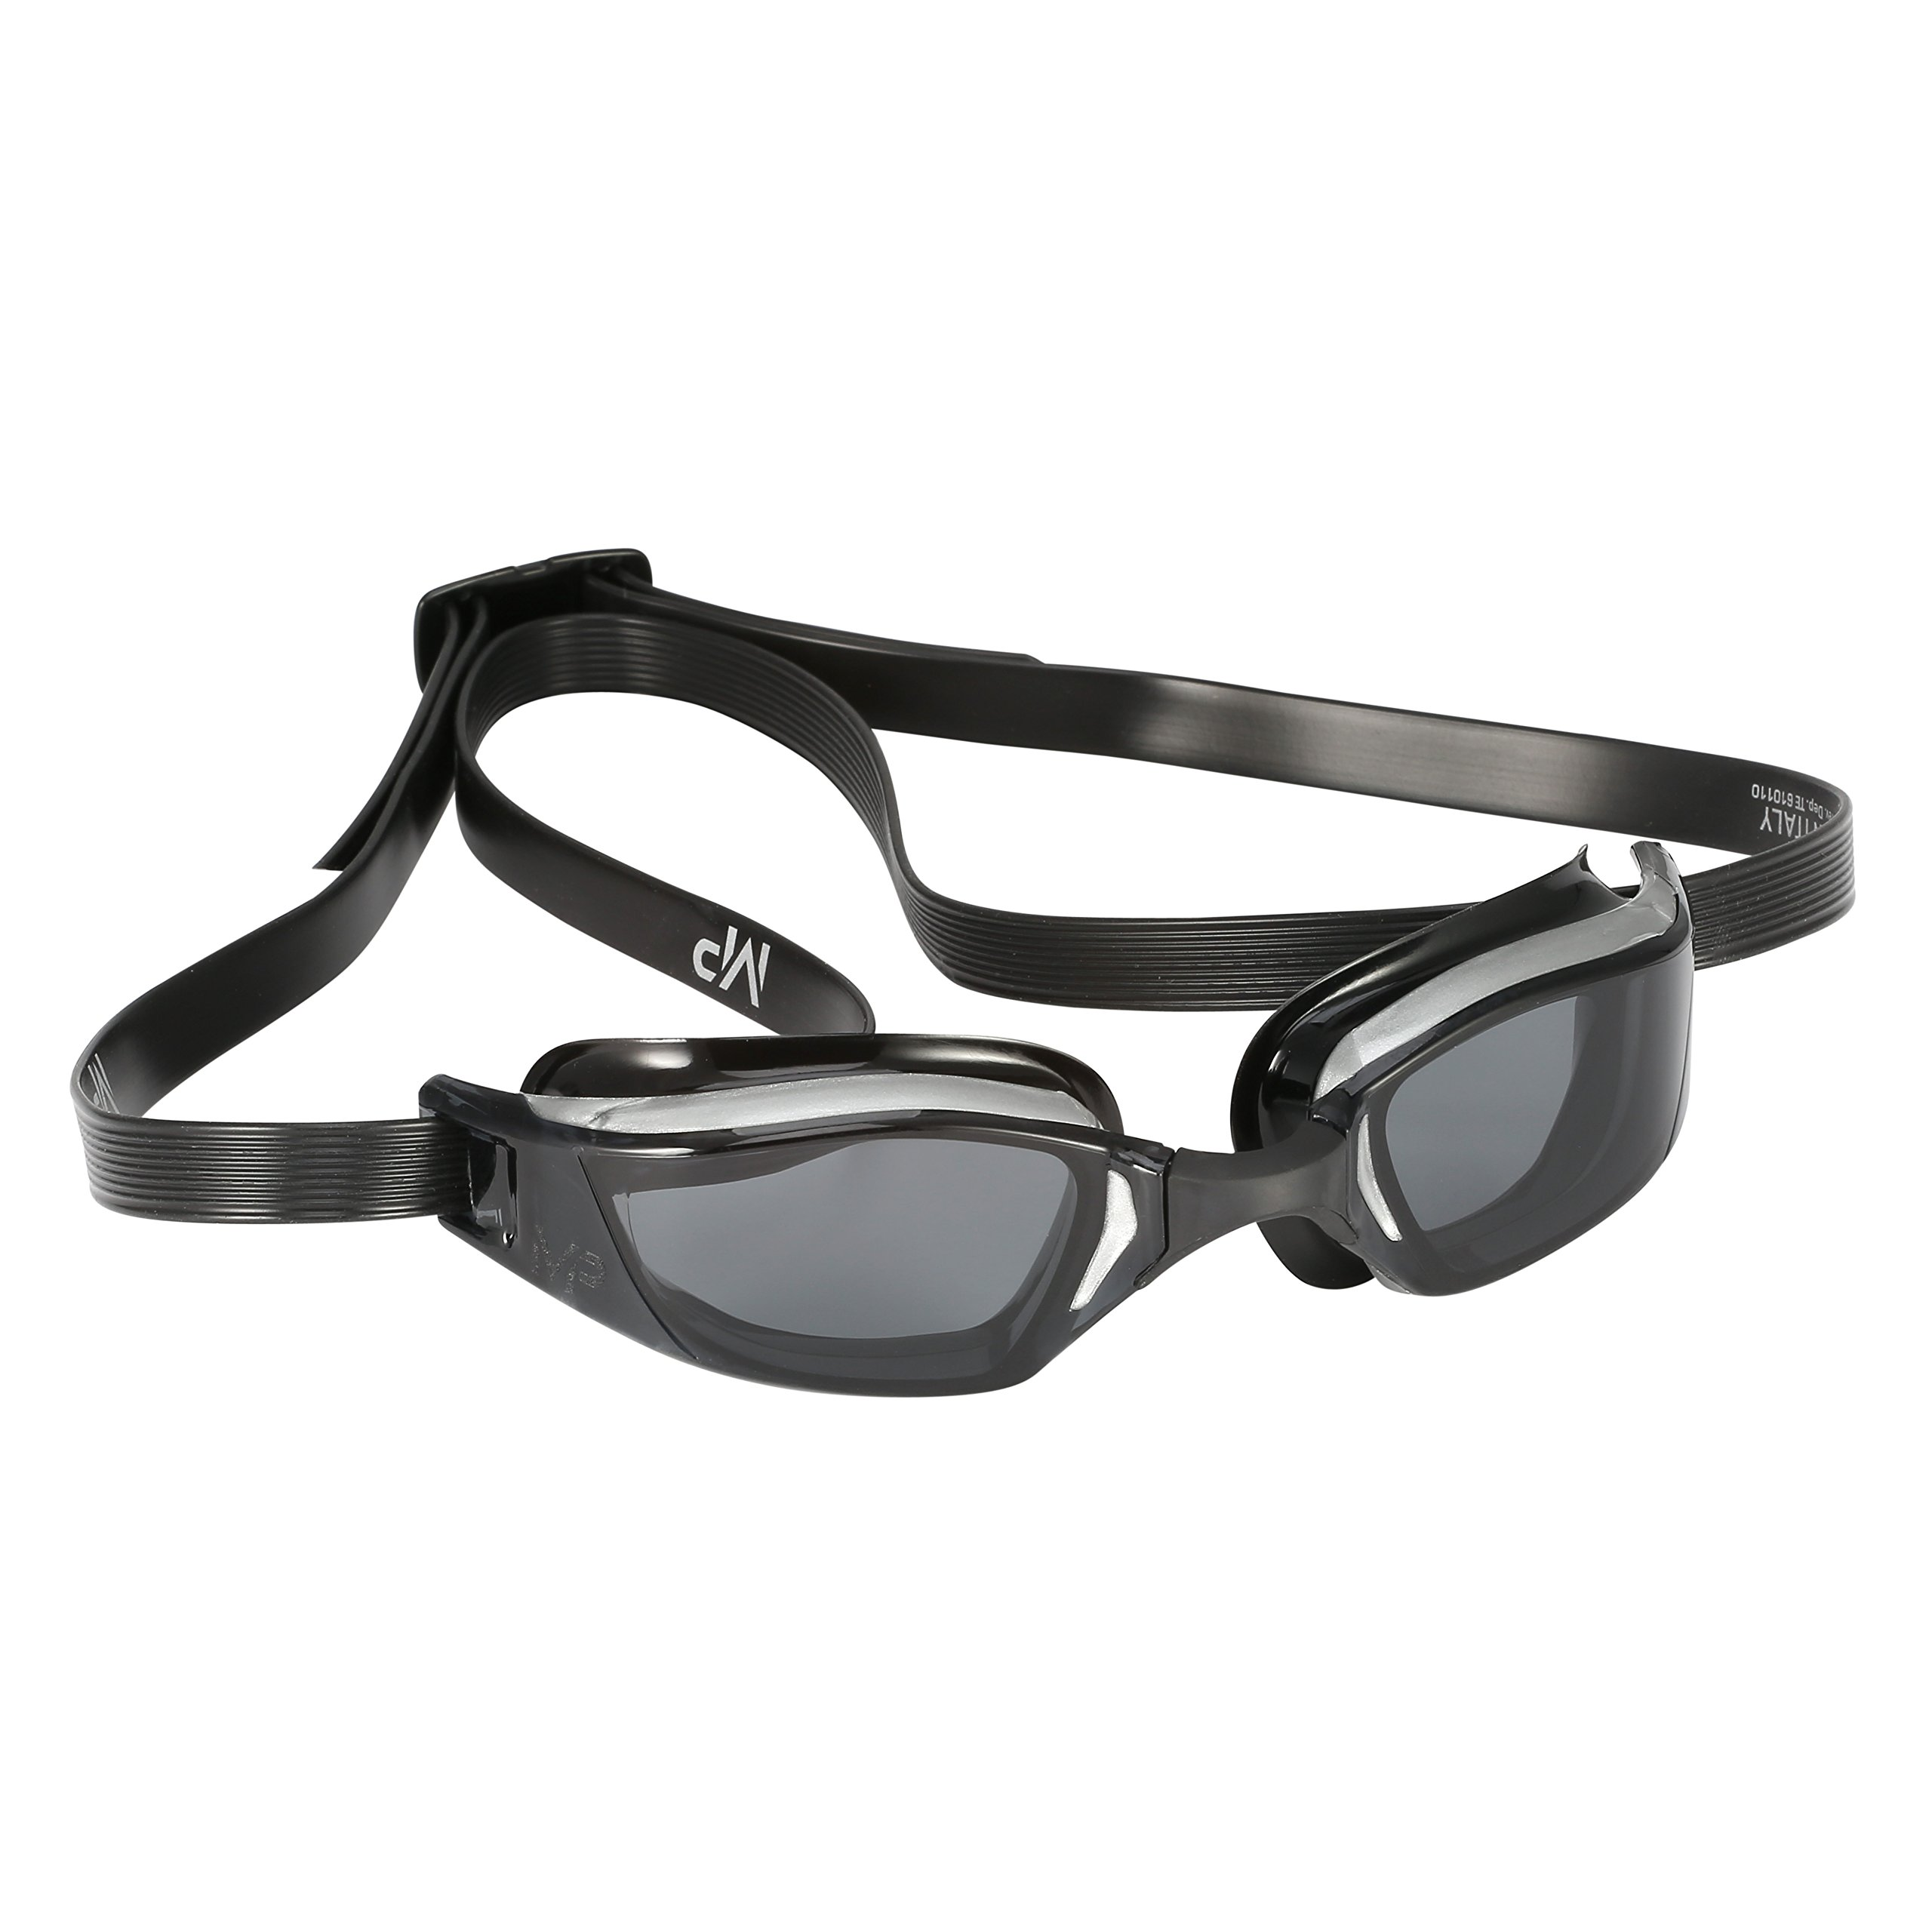 MP Michael Phelps XCEED Swimming Goggles, Smoke Lens, Grey/Black Frame